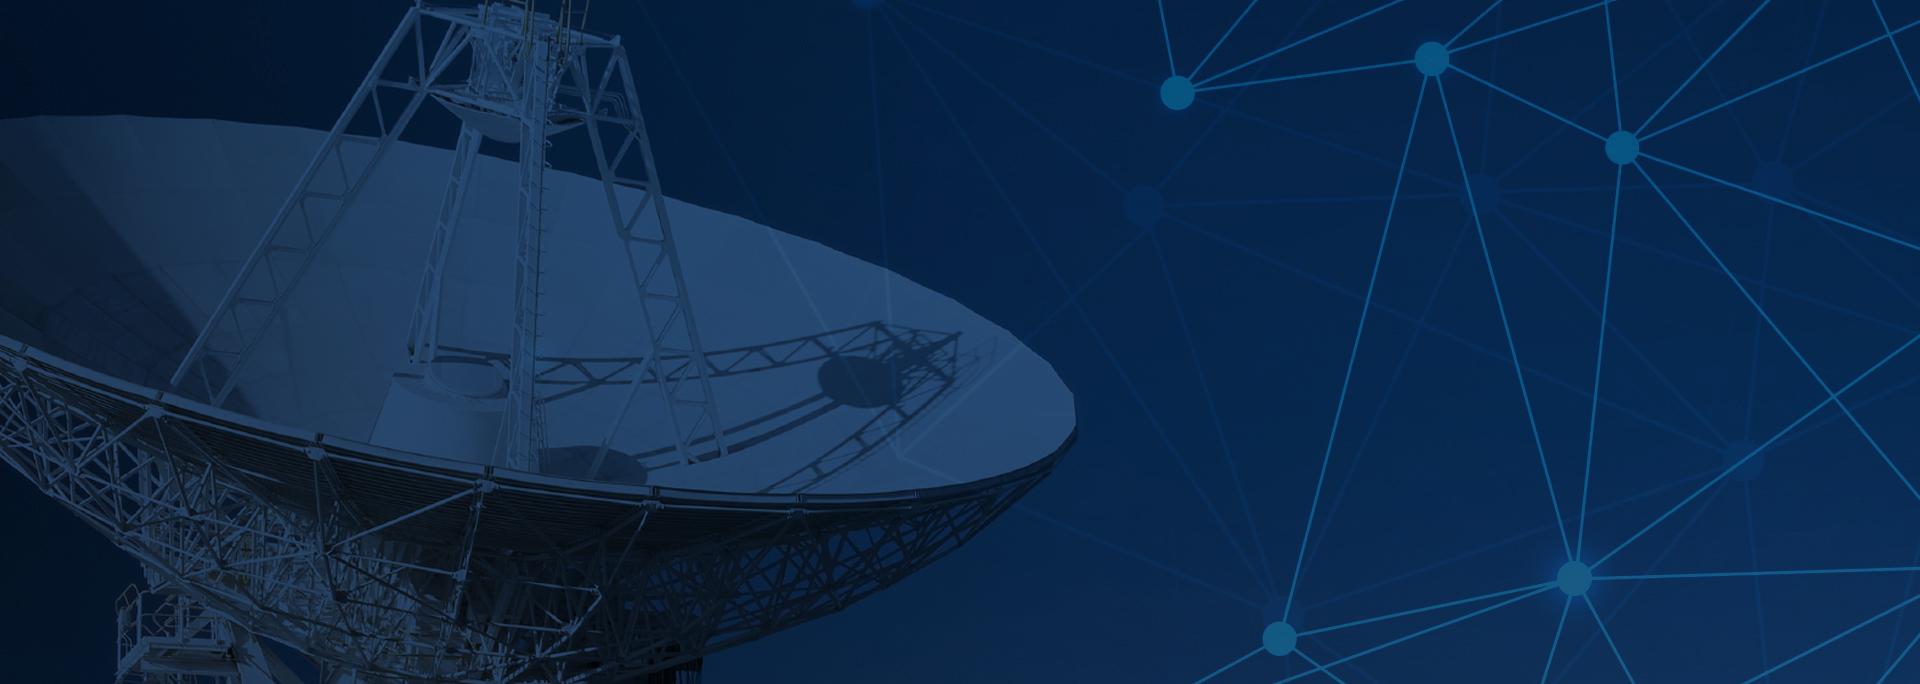 blue-network-patterned-background